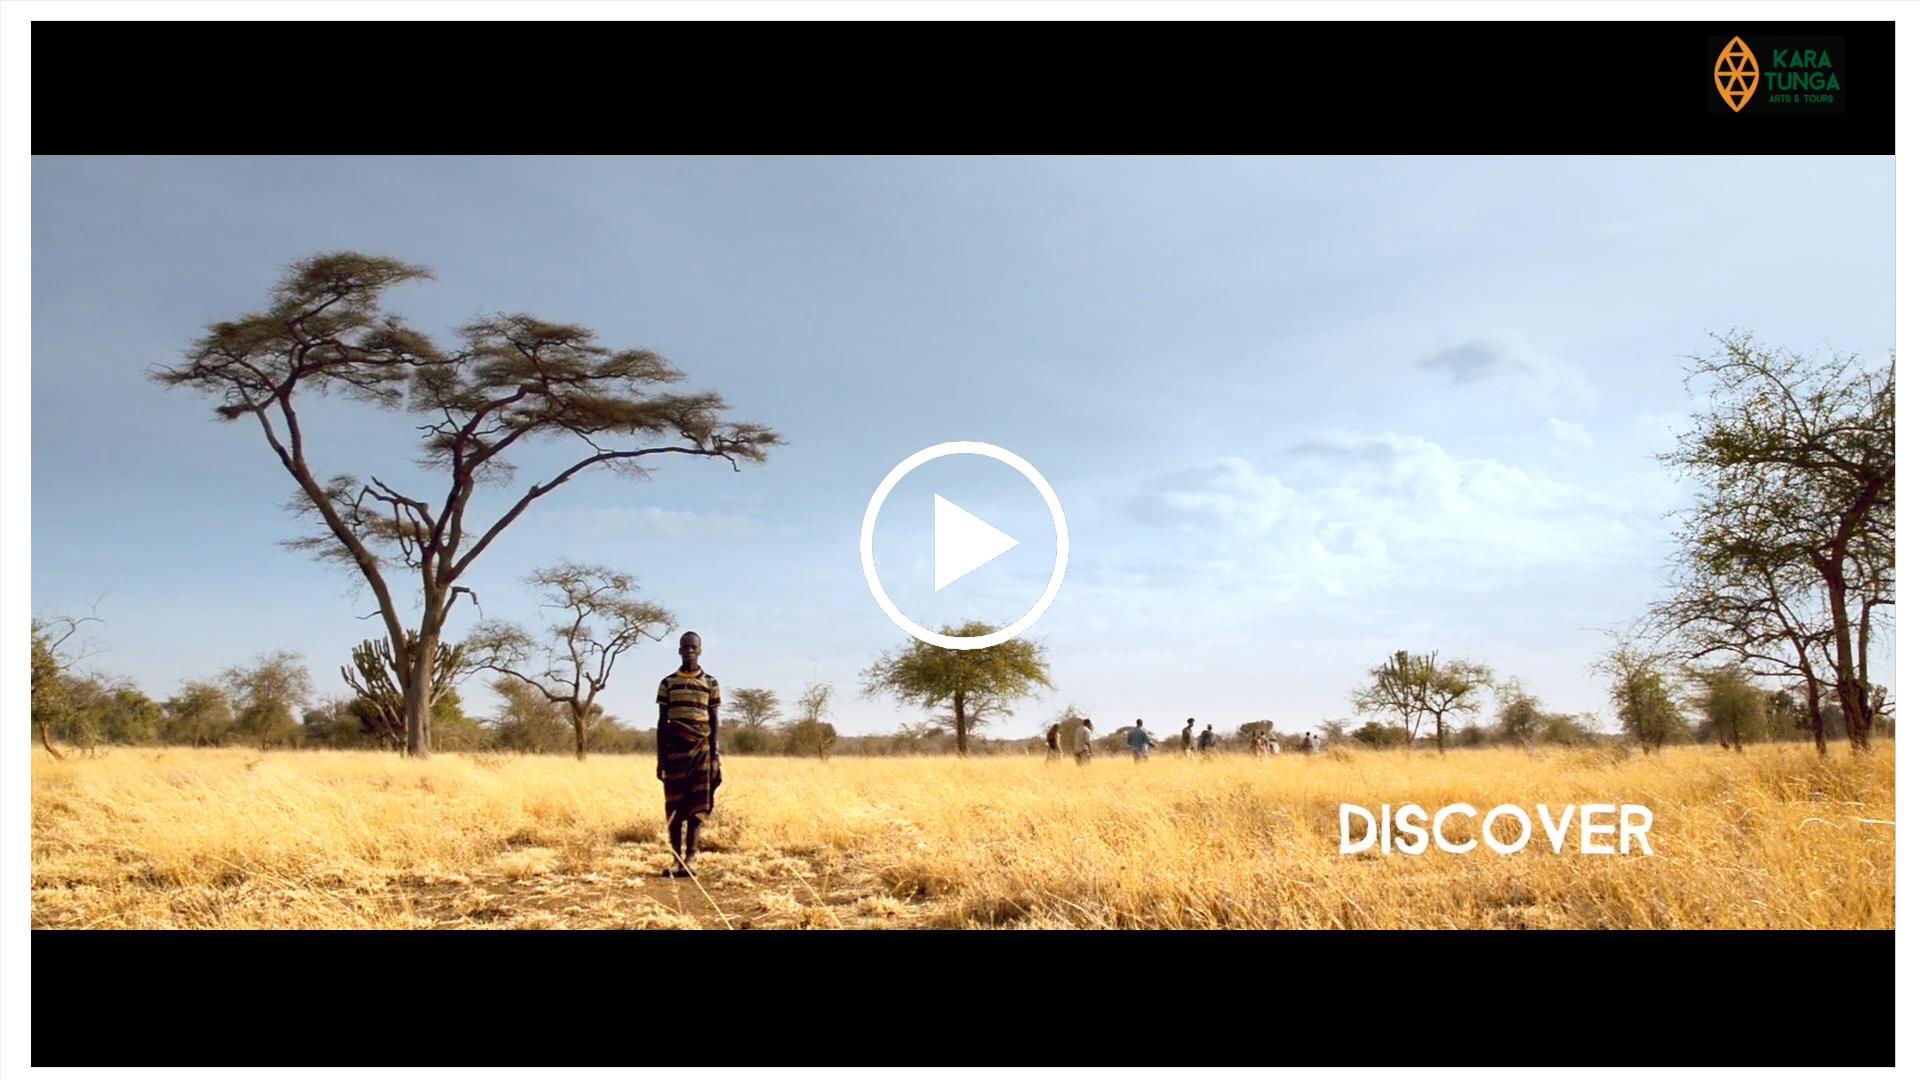 film-werbung-discover-uganda-karamoja